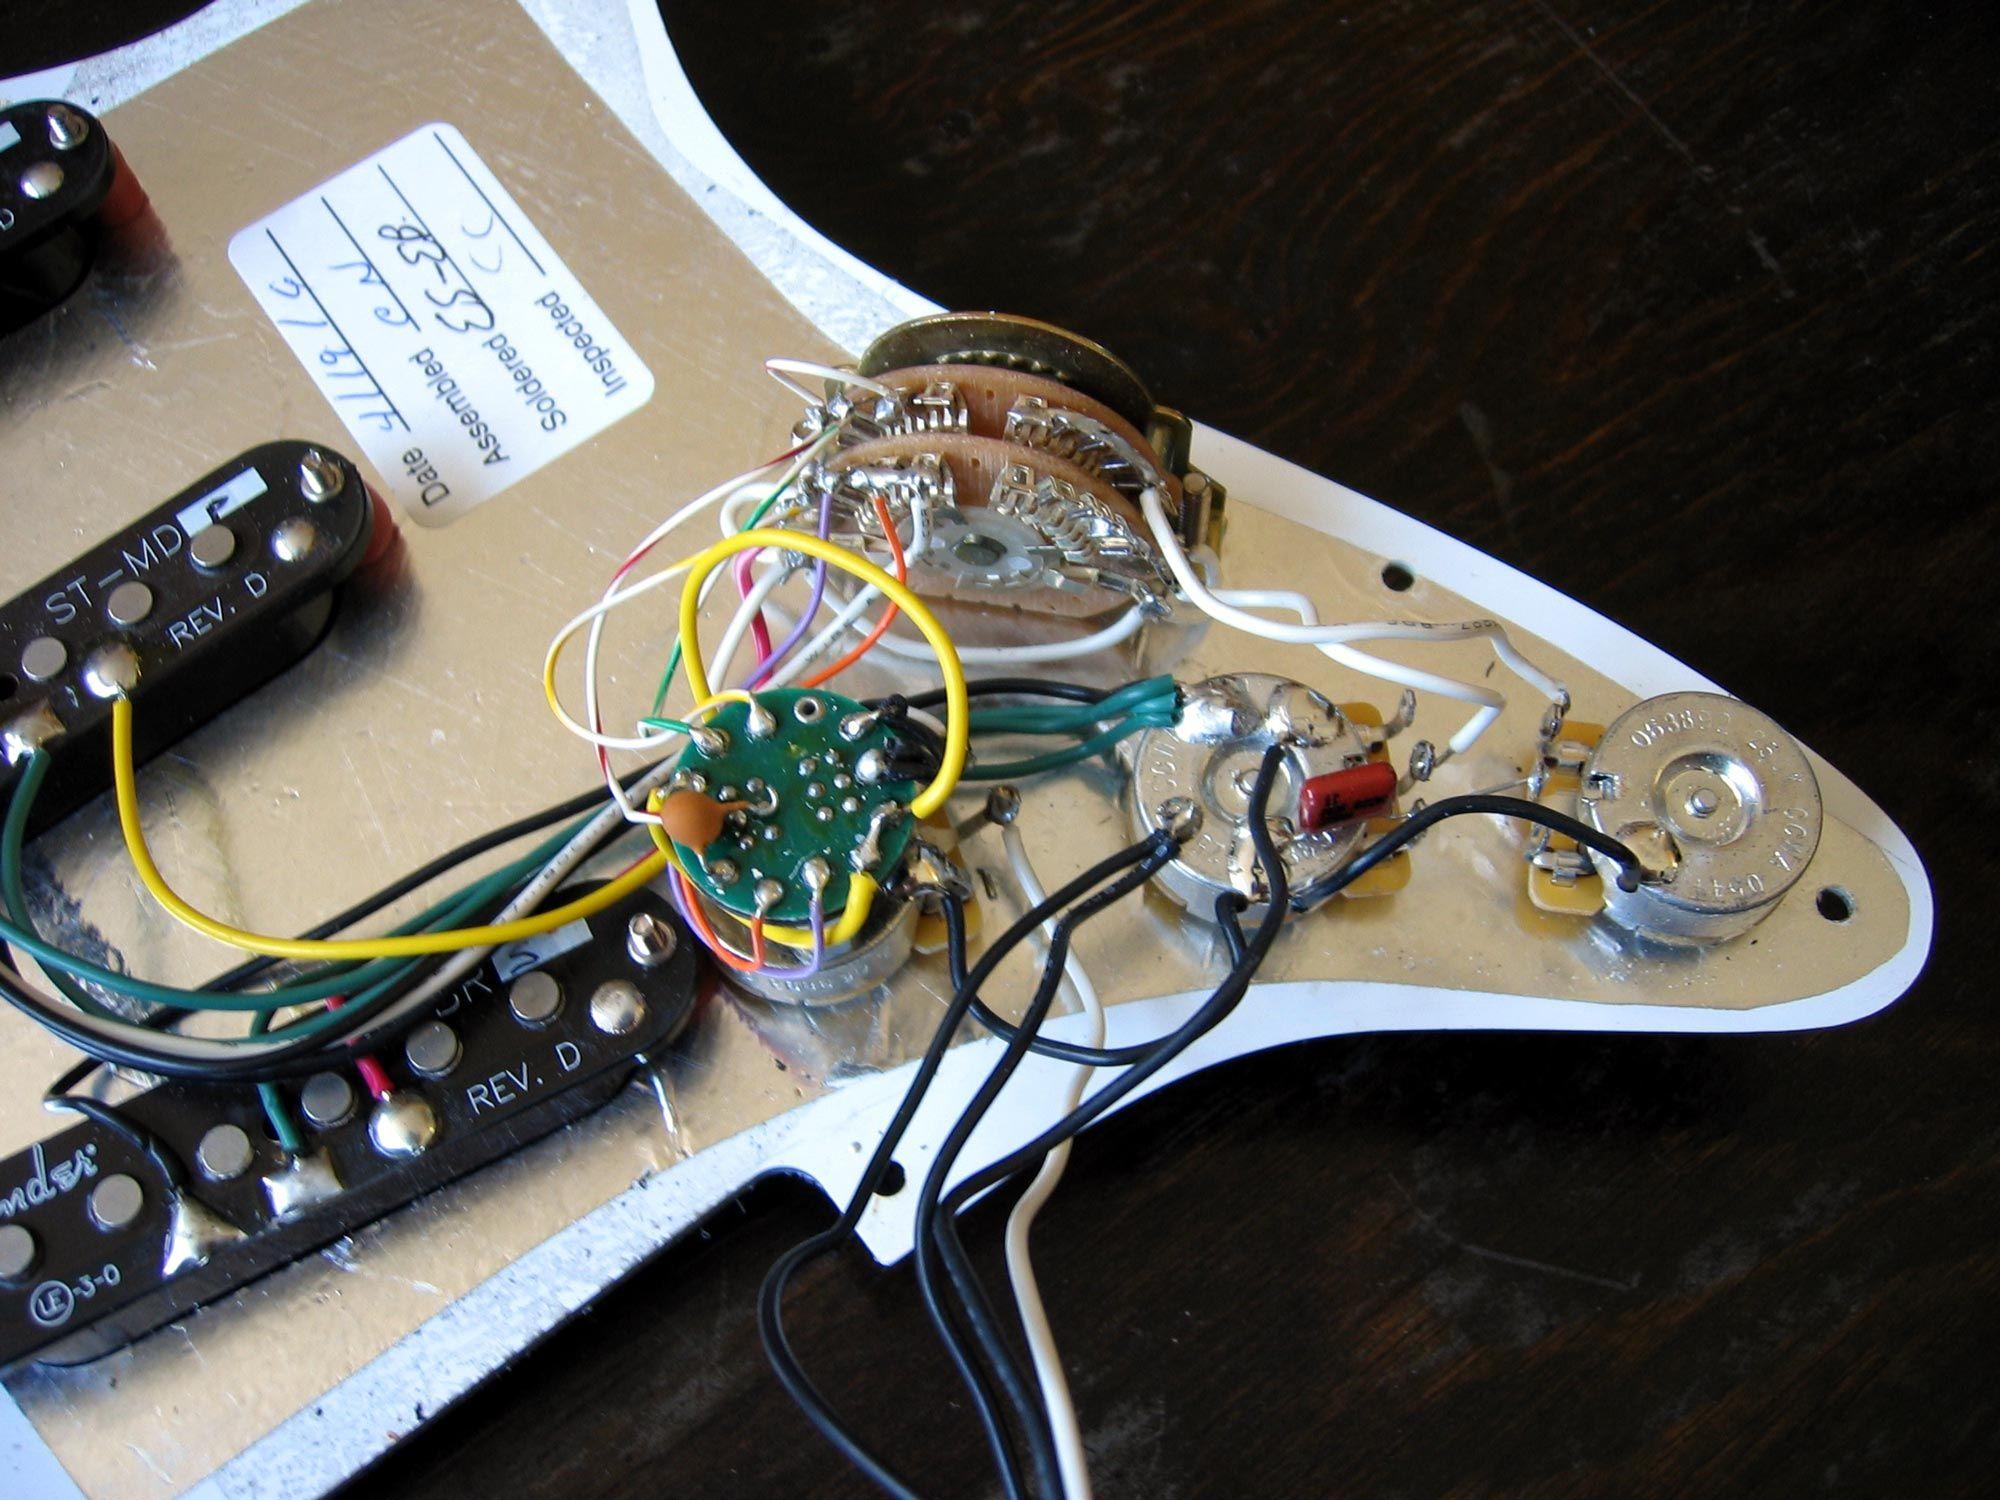 Wiring Diagram Wiring Diagram For Fender Strat Guitar Wiring Diagram